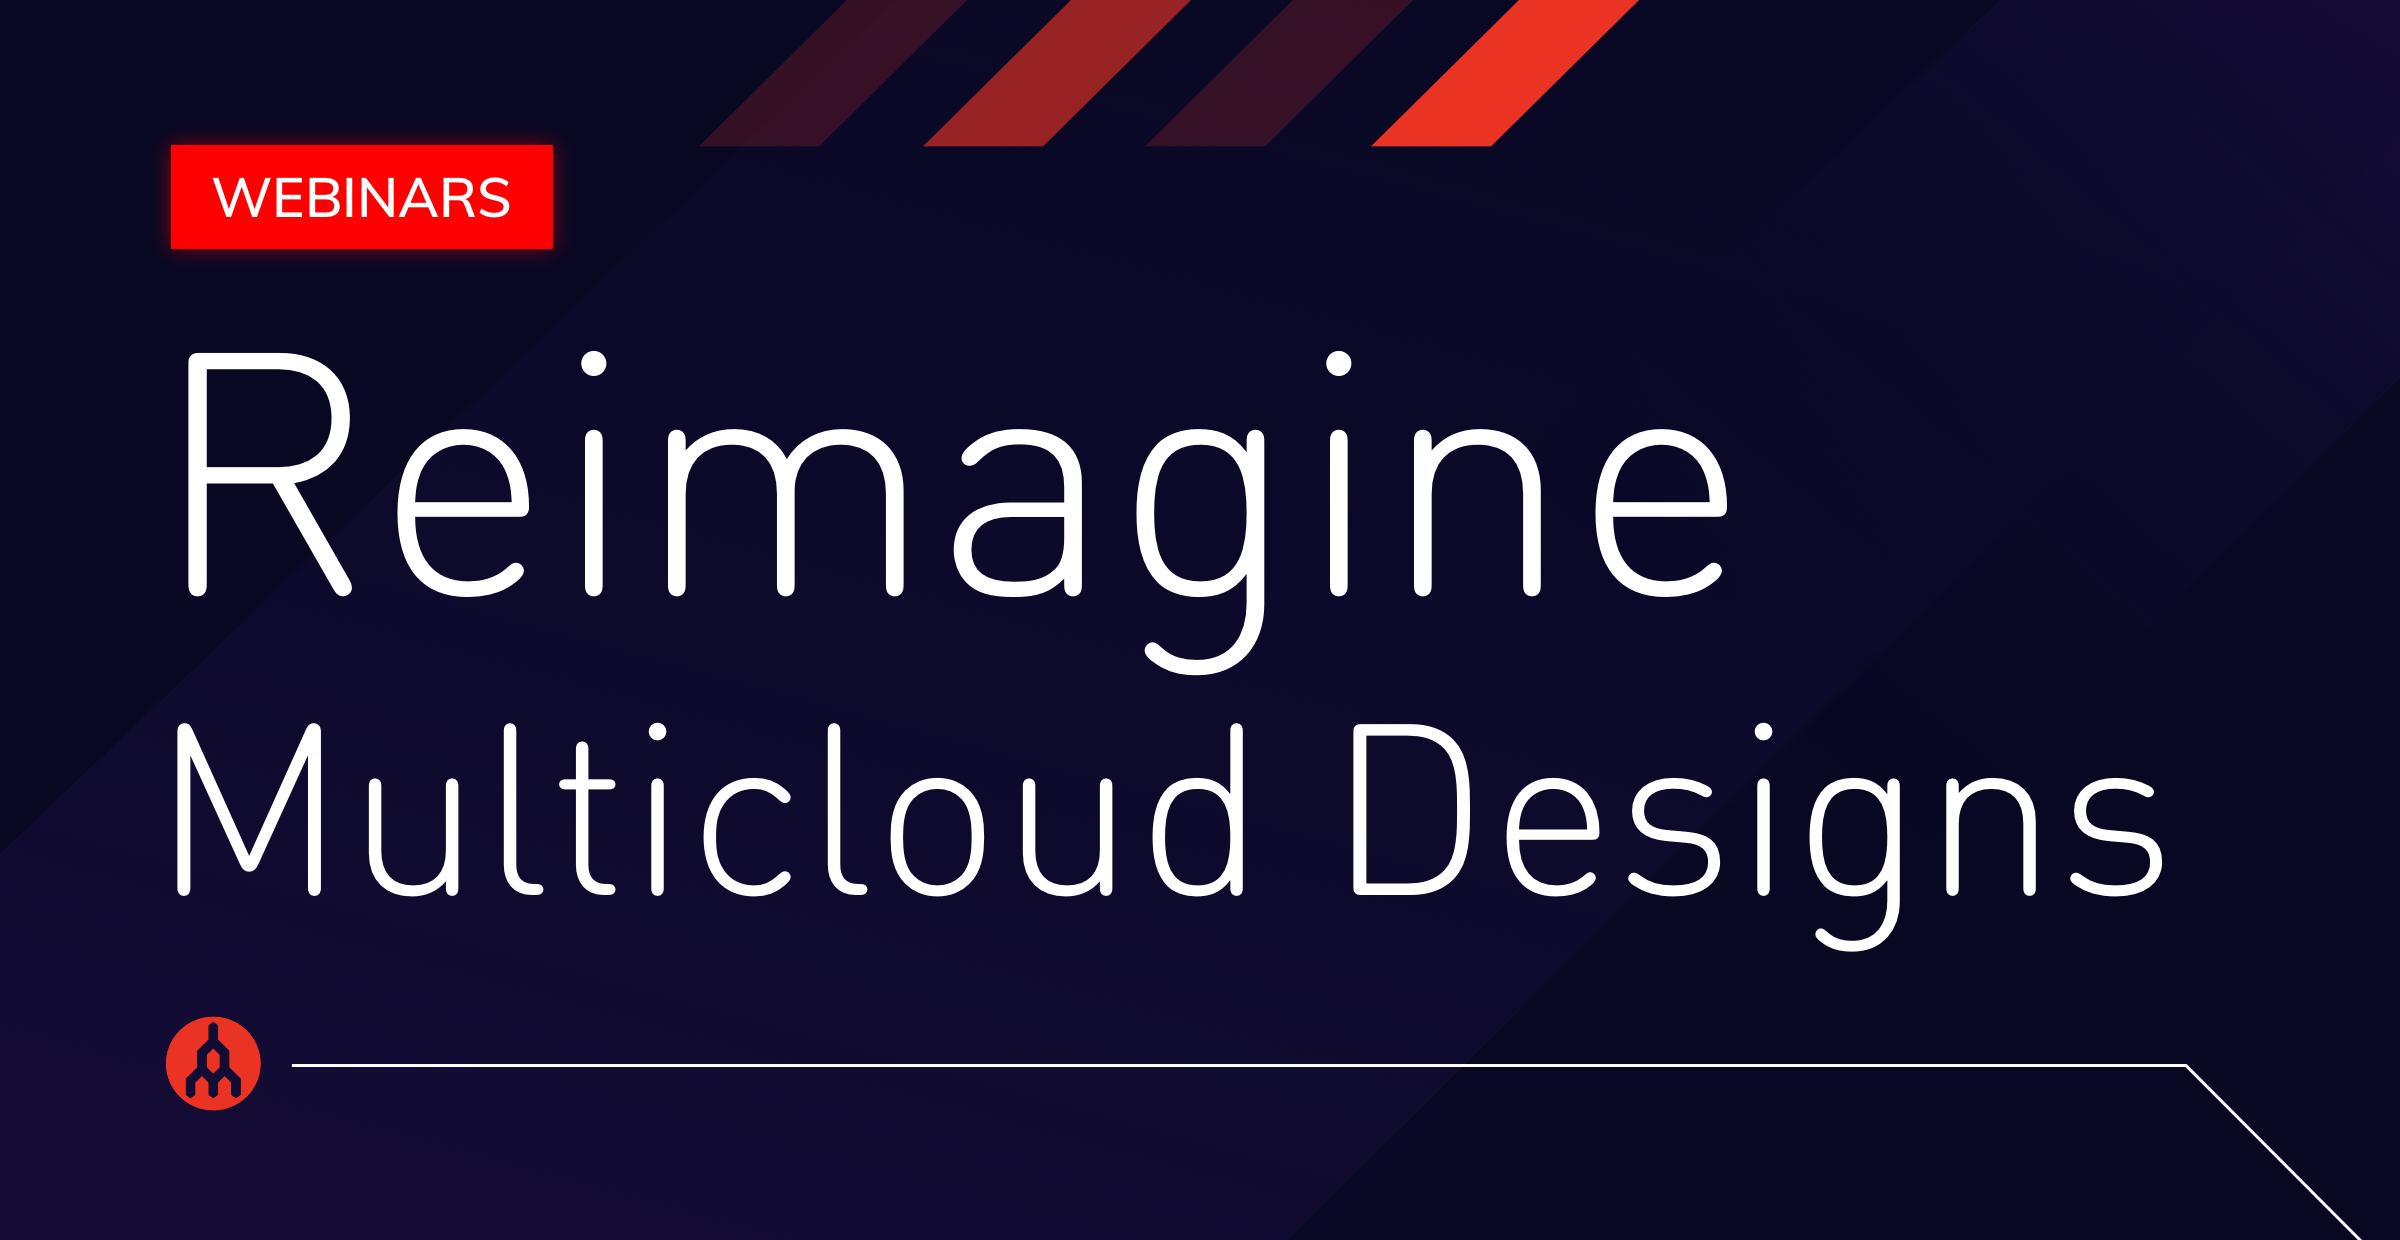 Register for the Reimagine Multicloud Designs webinar